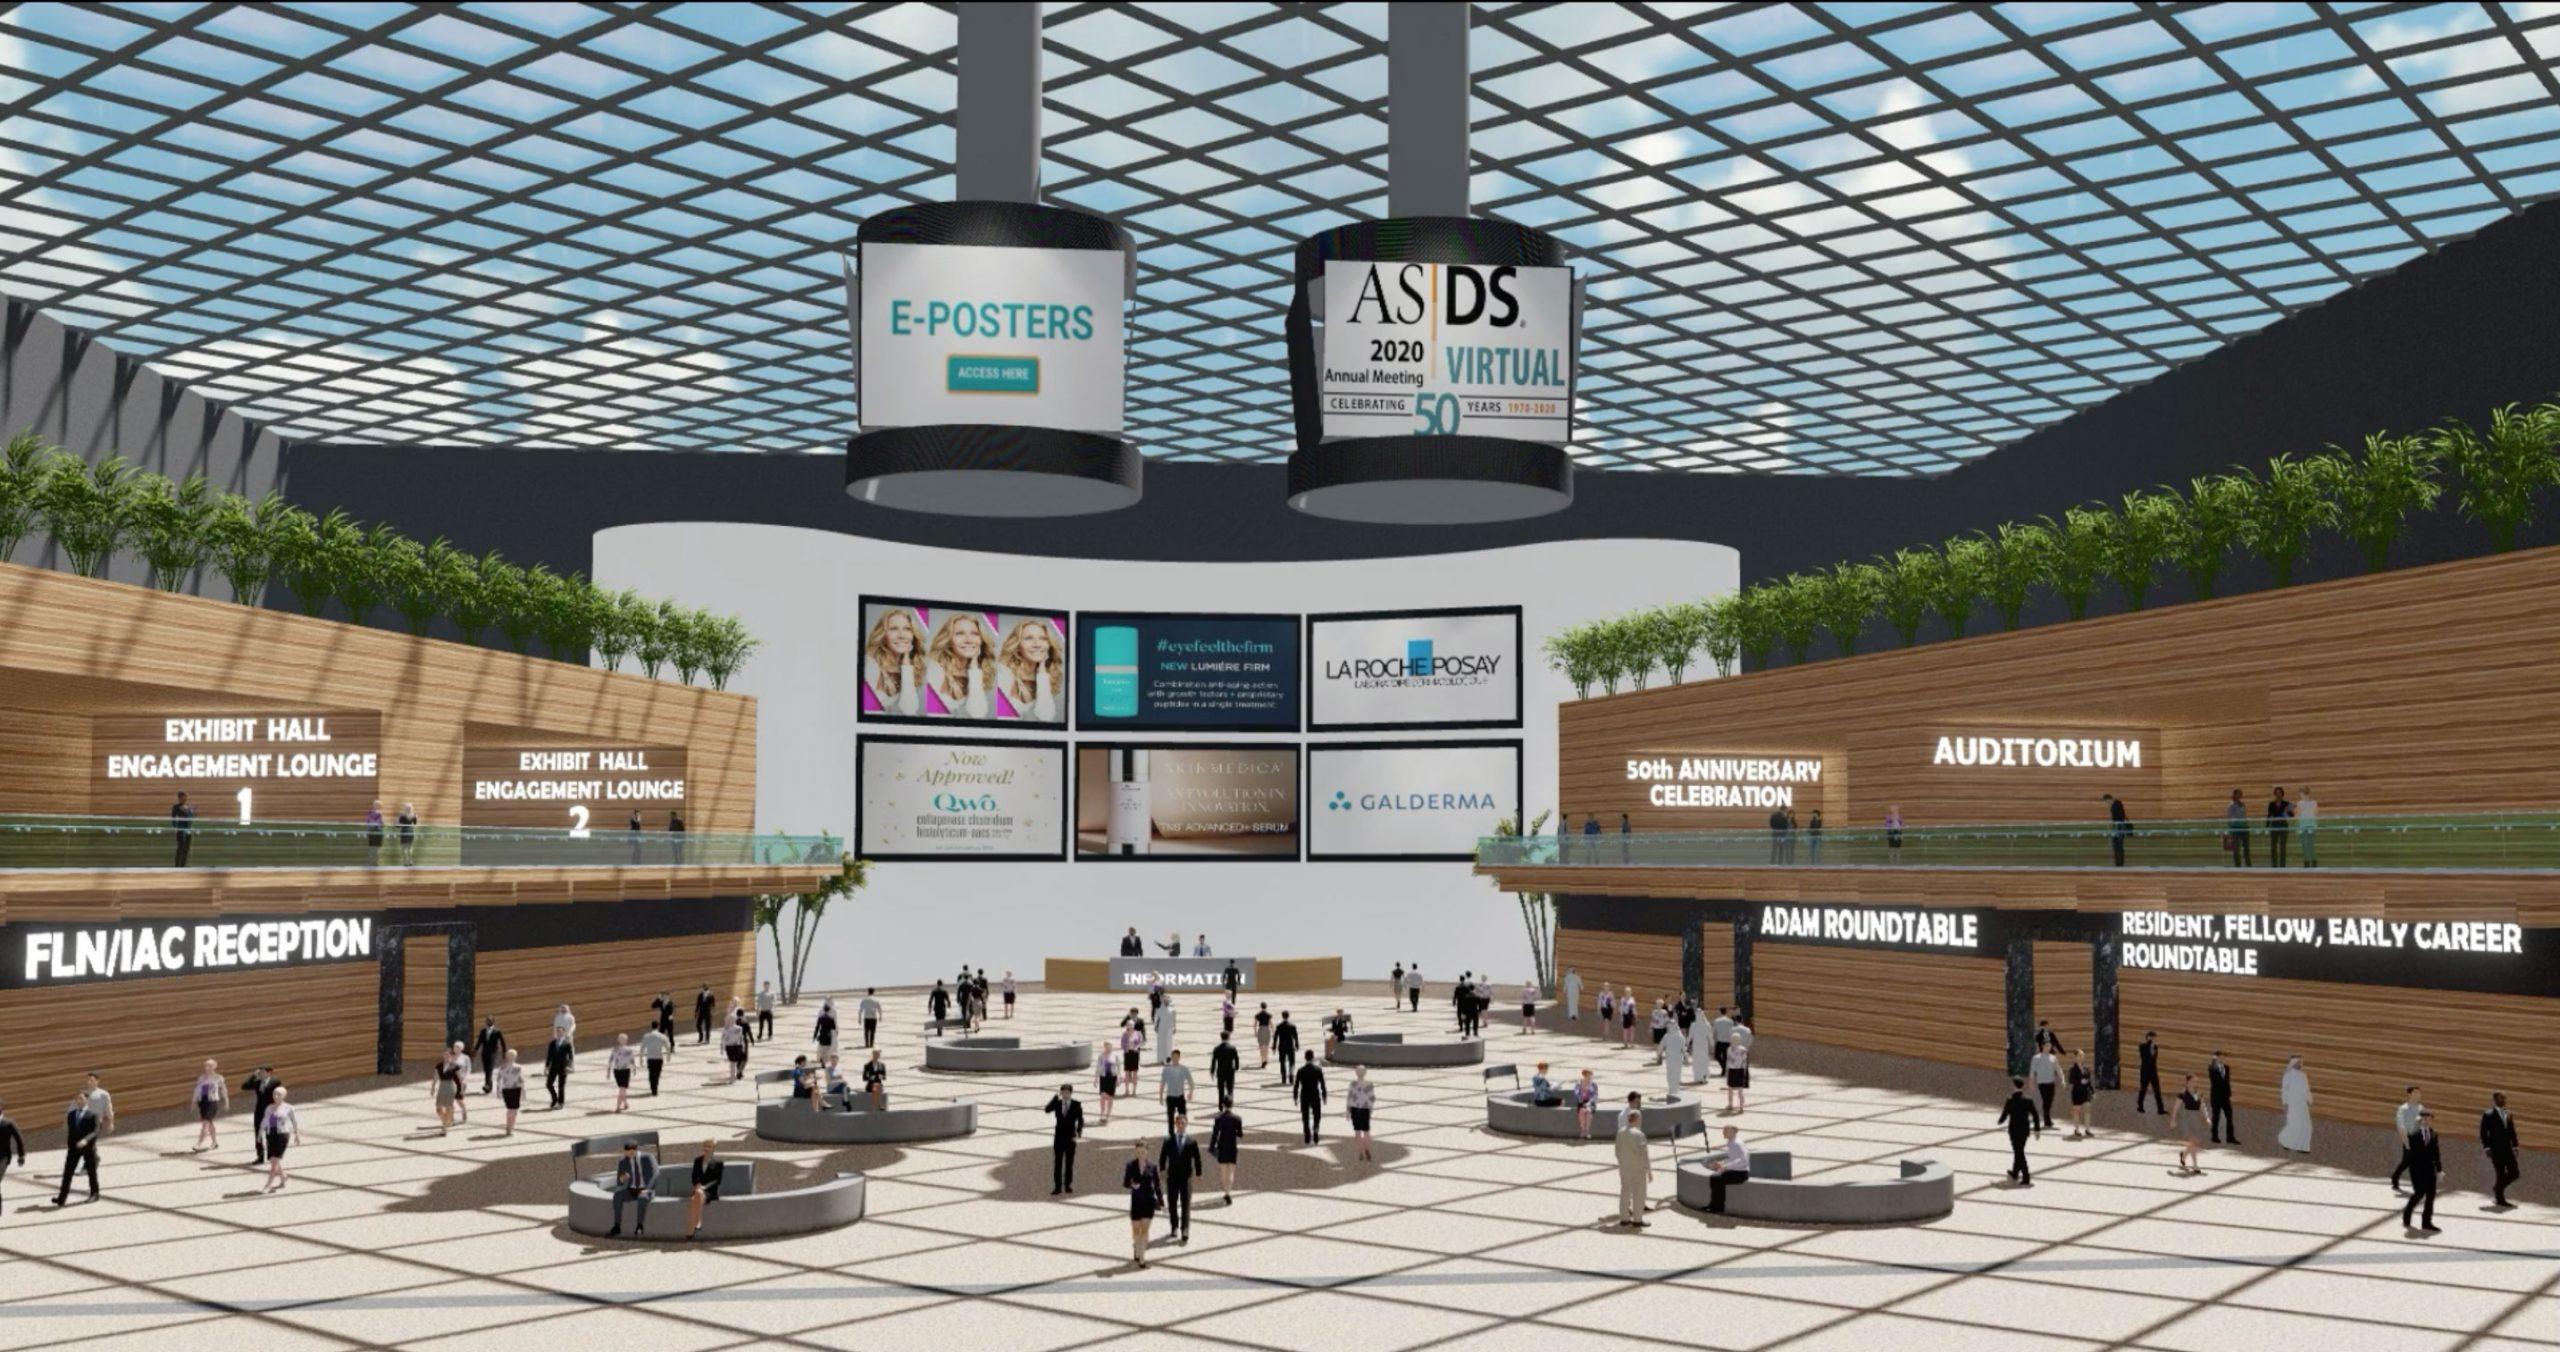 ASDS lobby for event